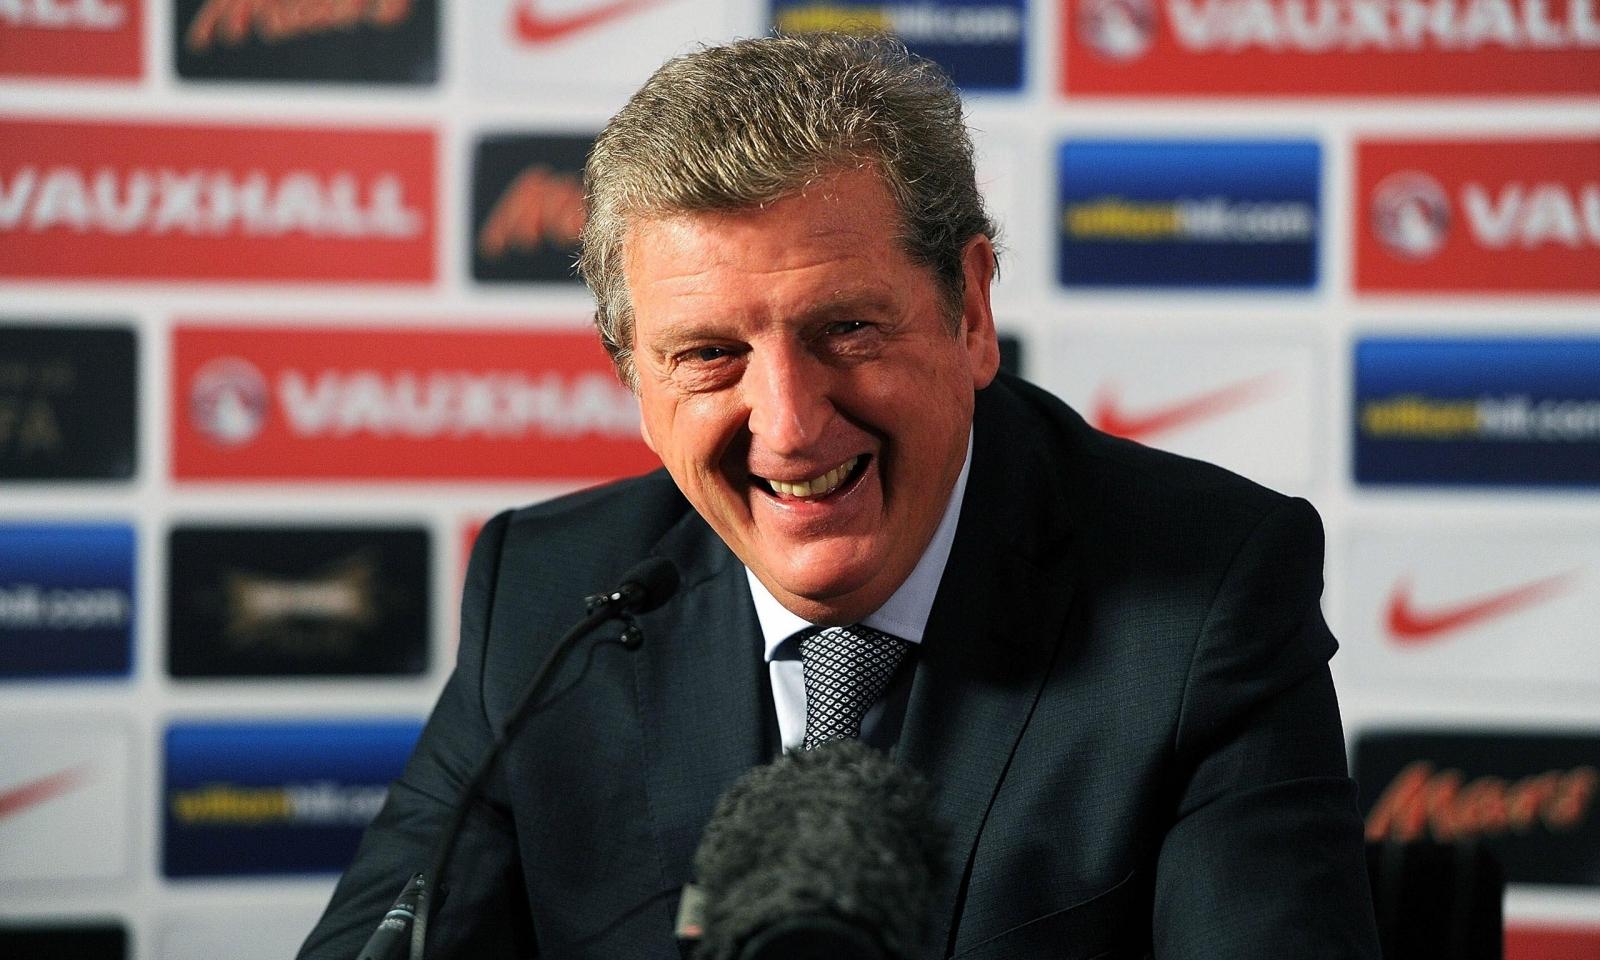 Roy Hodgson Especially Impressed with Lallana against San Marino